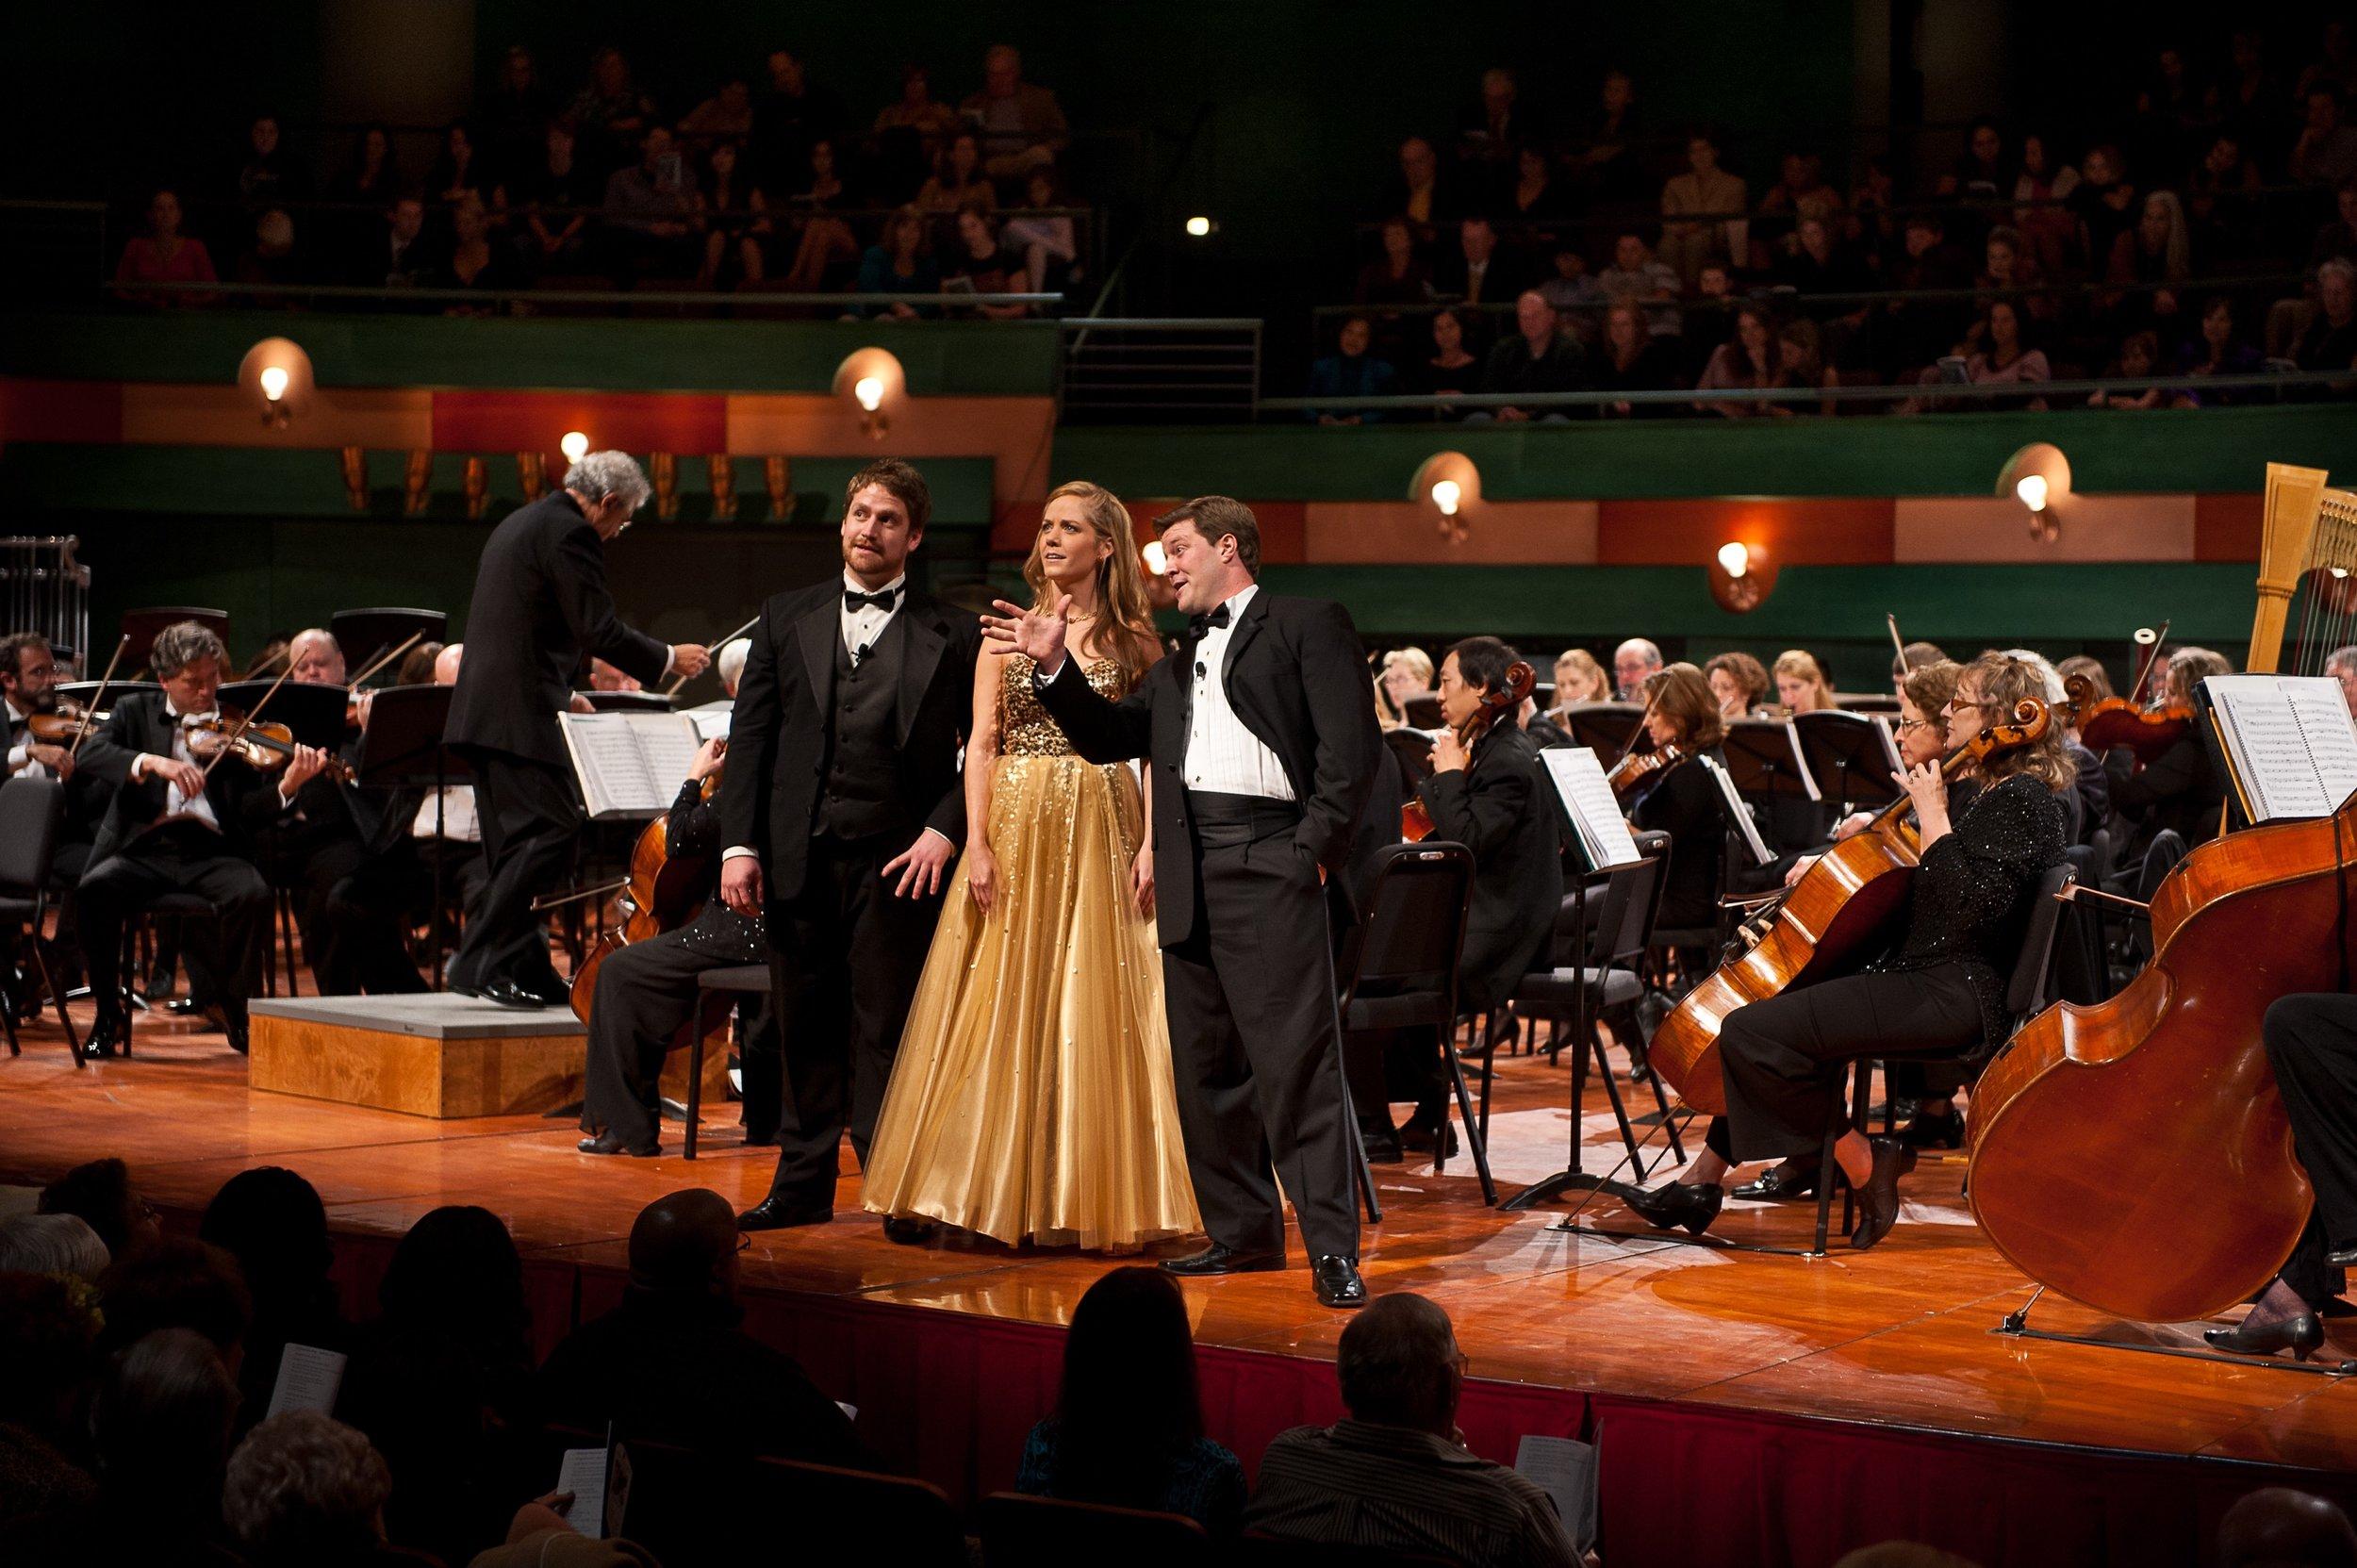 Soprano Soloist with the Corpus Christi Orchestra